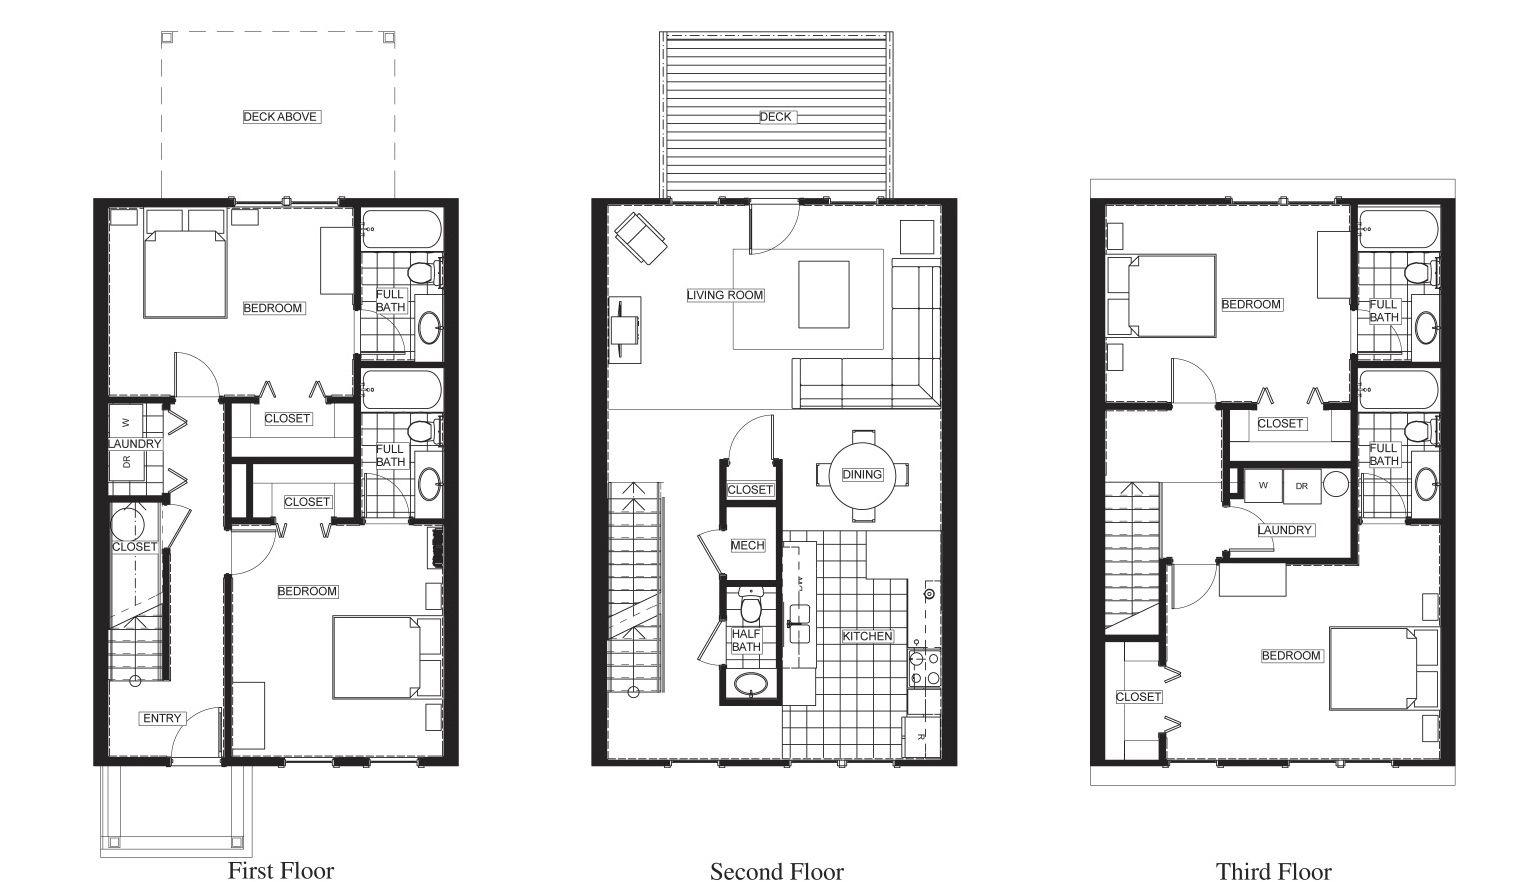 Charleston Townes Floor Plan Floor Plans How To Plan Flooring